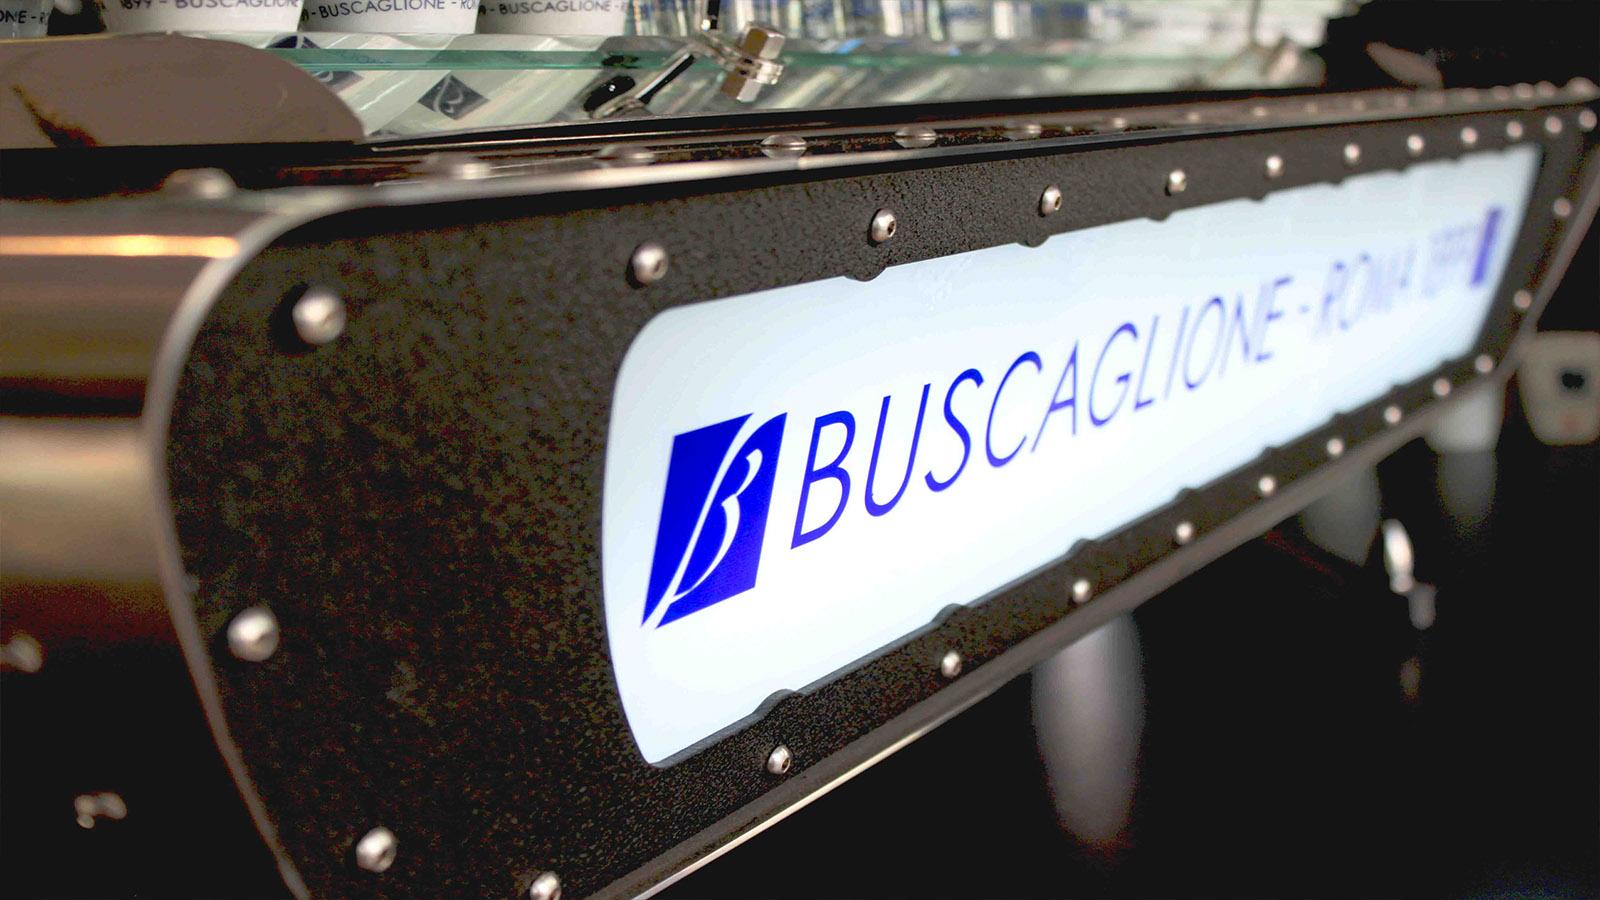 Slider-3-Buscalion